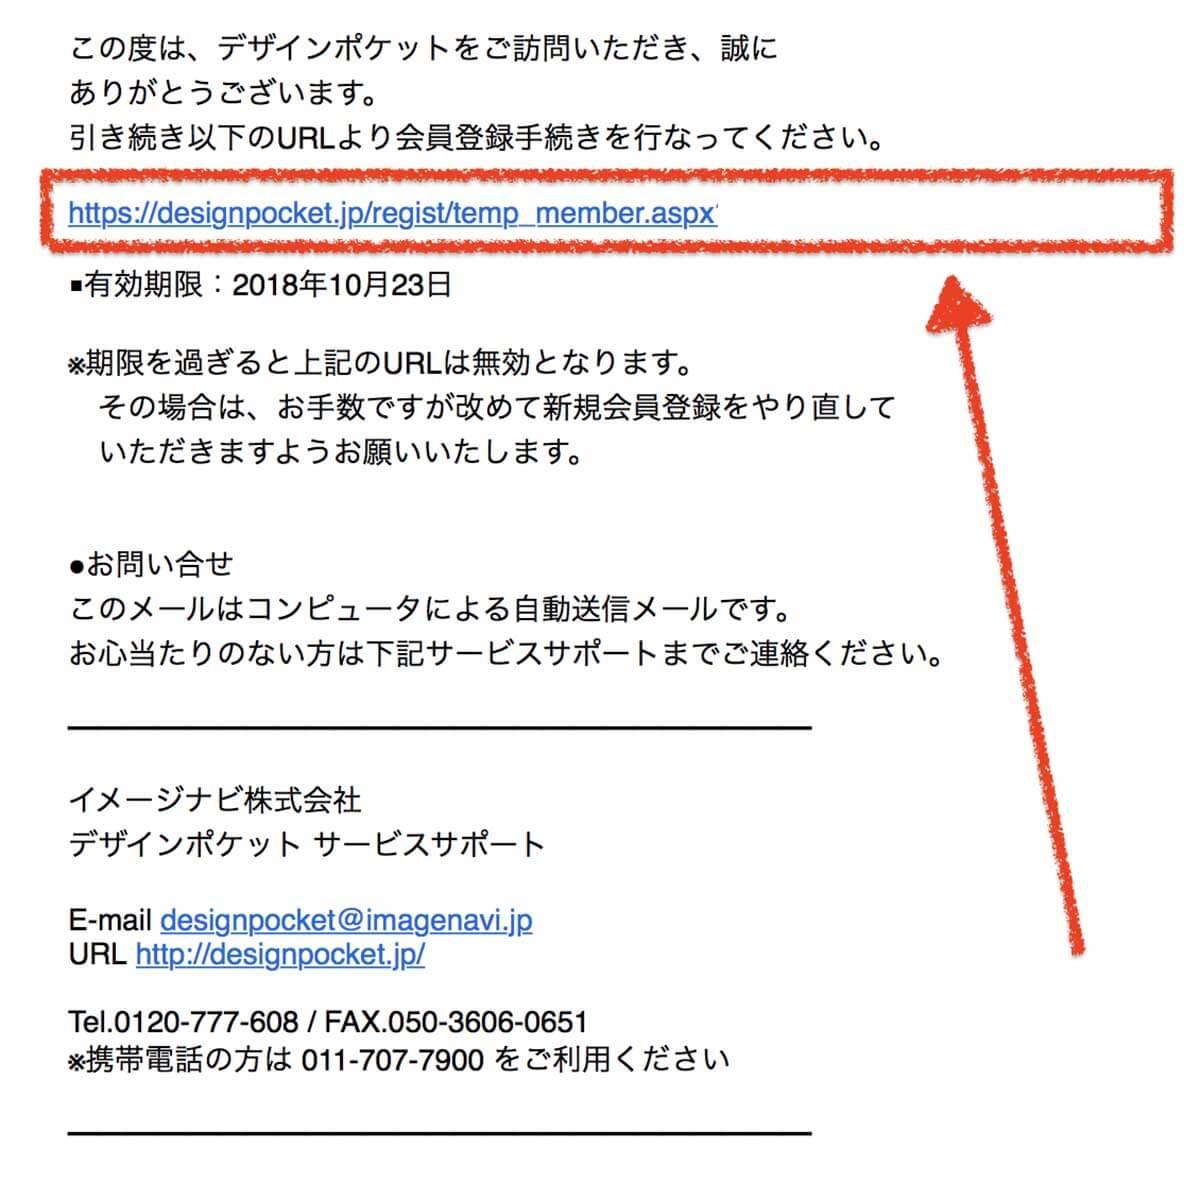 昭和書体 厳選筆文字5書体セット